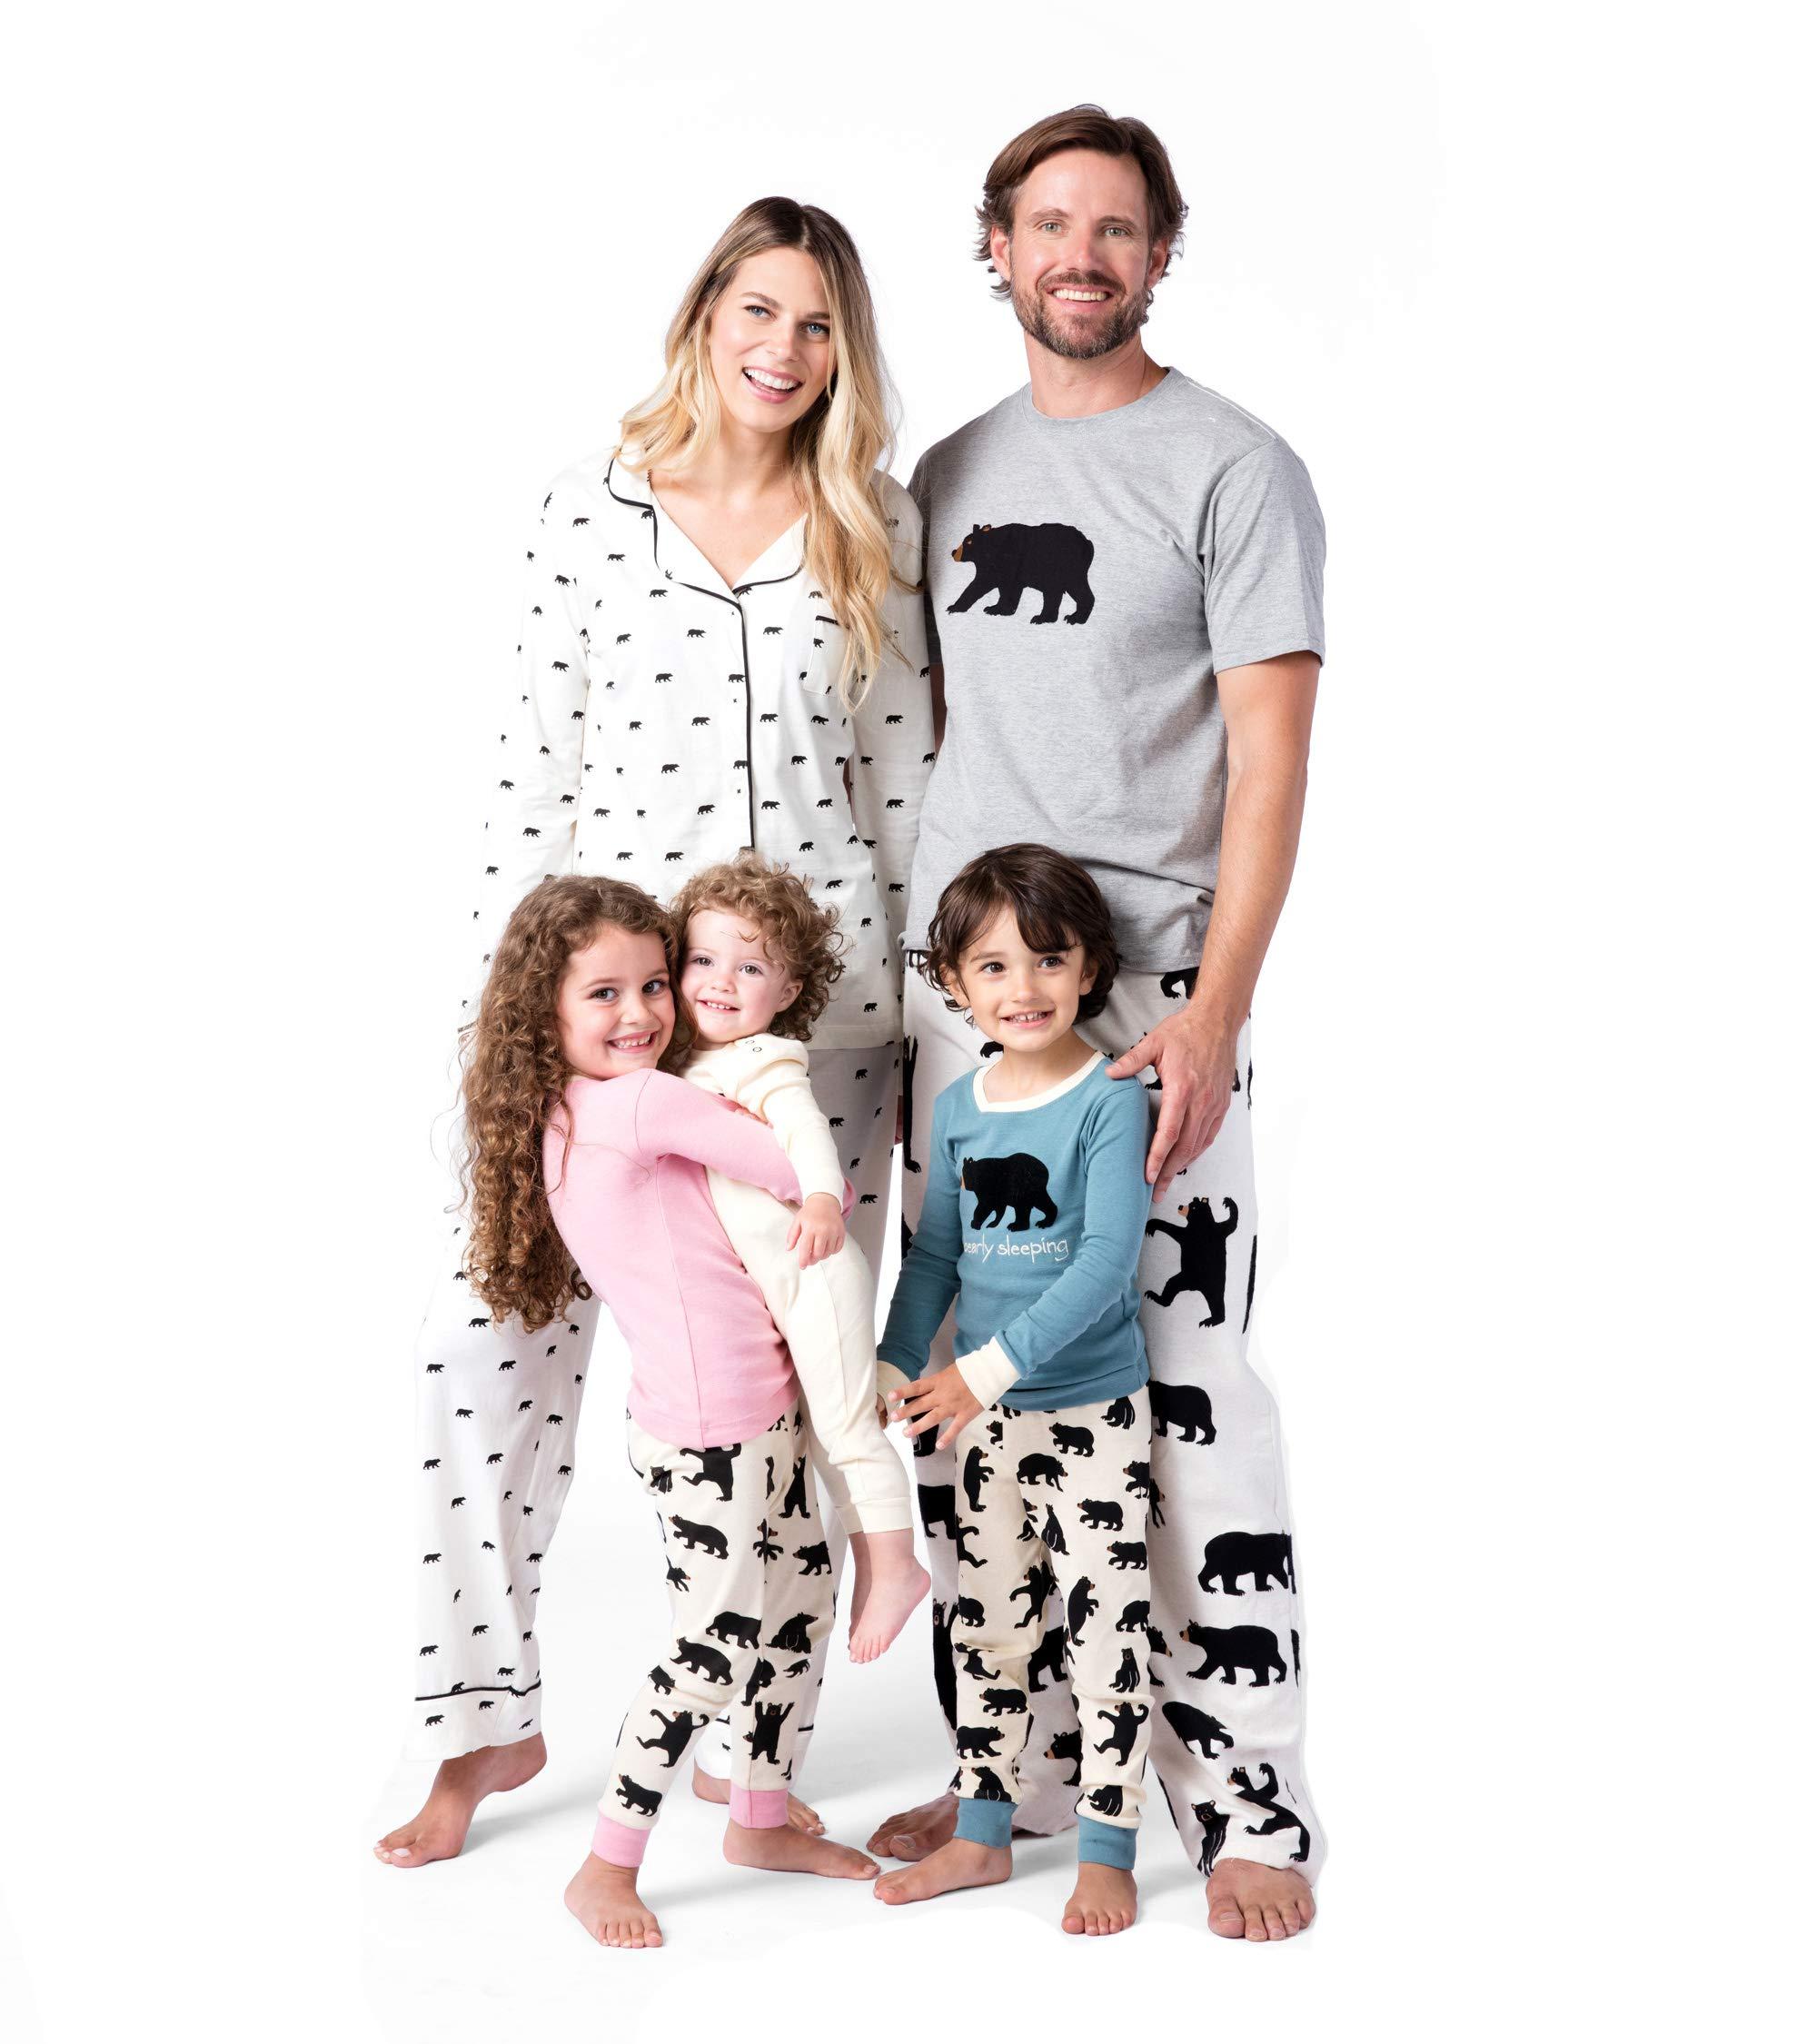 Little Blue House By Hatley baby-boys Bear Family Pajamas, Infant Romper & Cap - Black Bears, 6-12 Months by Little Blue House by Hatley